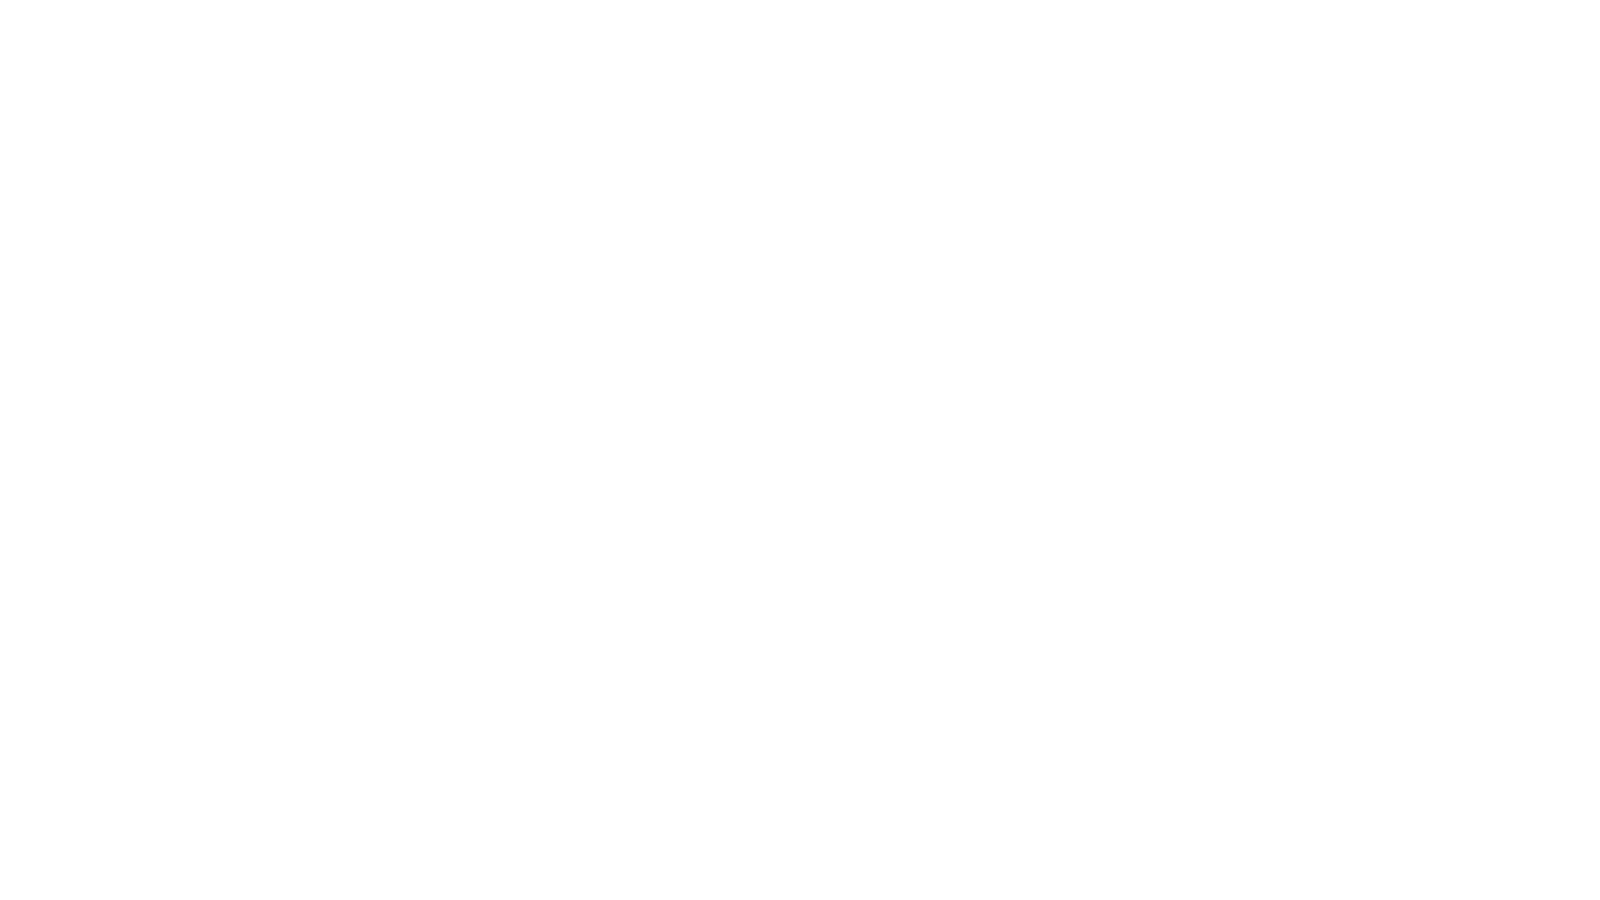 Sanghadeva gives a rousing talk on the Sangrahavastu of Beneficial Activity.  The Four Sangrahavastus - Means of Unification Dana - Generosity Priyavadita - Kindly Speech Arthacarya - Beneficial Activity Samanarthata - Exemplification